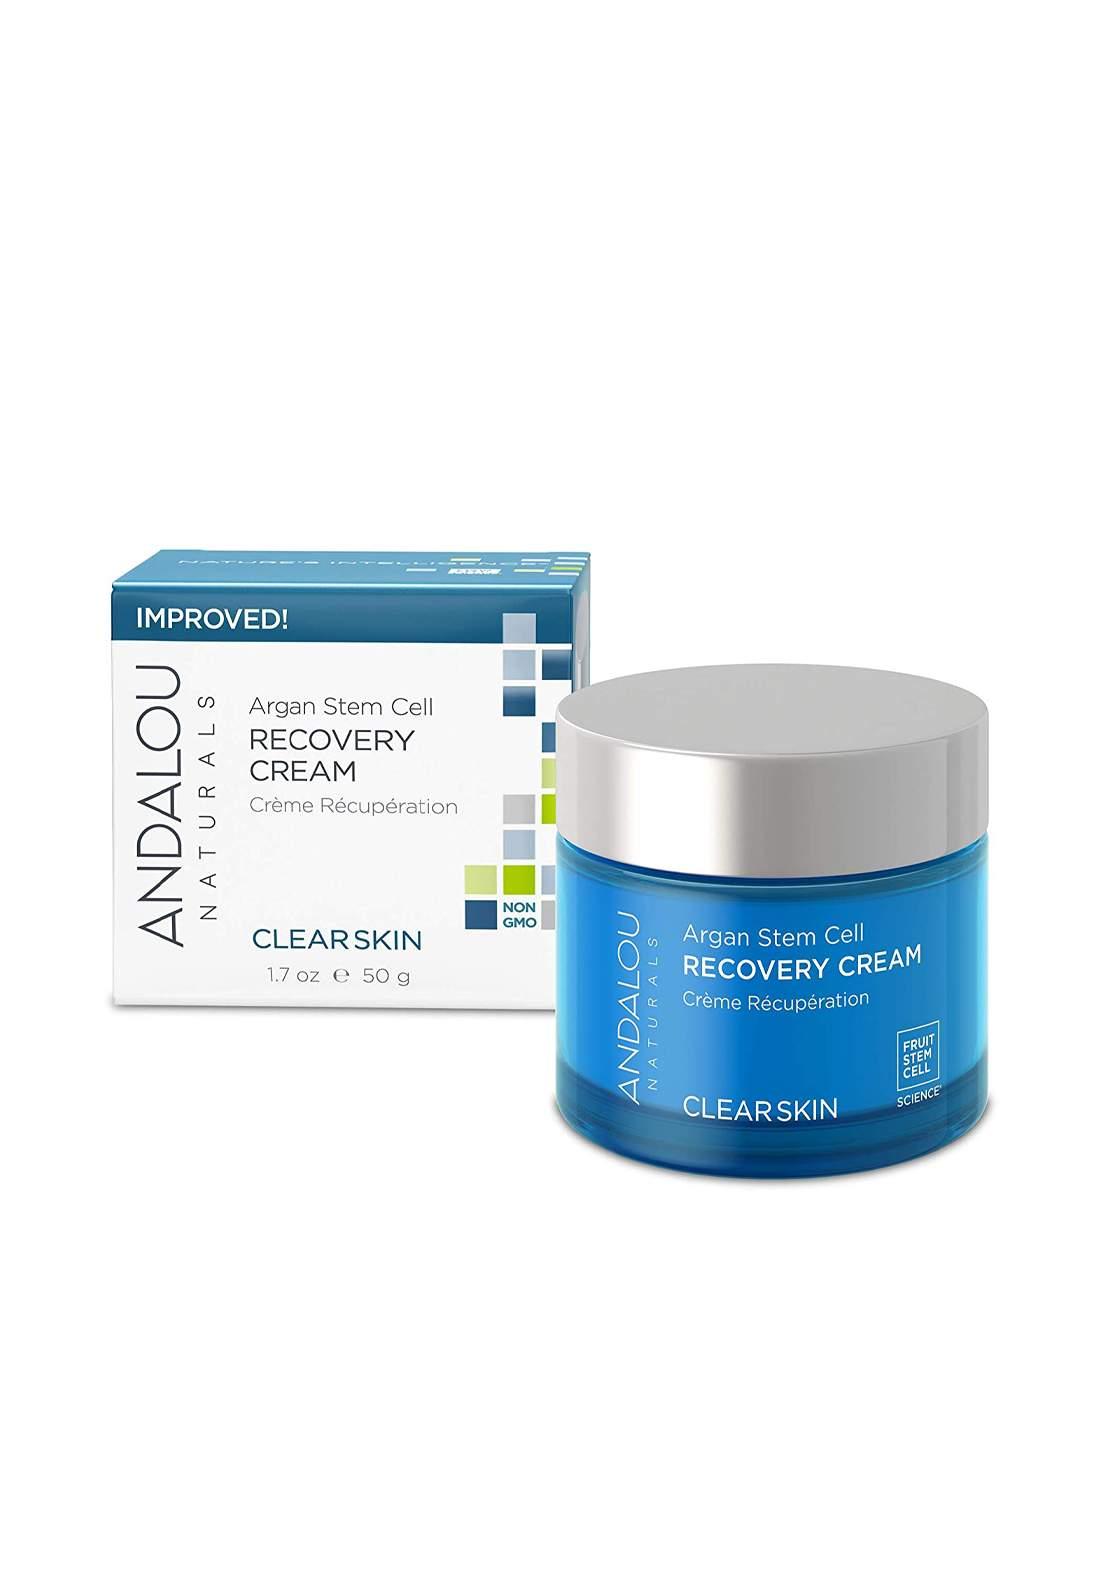 0251 Andalou Naturals Argan Stem Cell Recovery Cream 50g كريم ليلي للبشرة